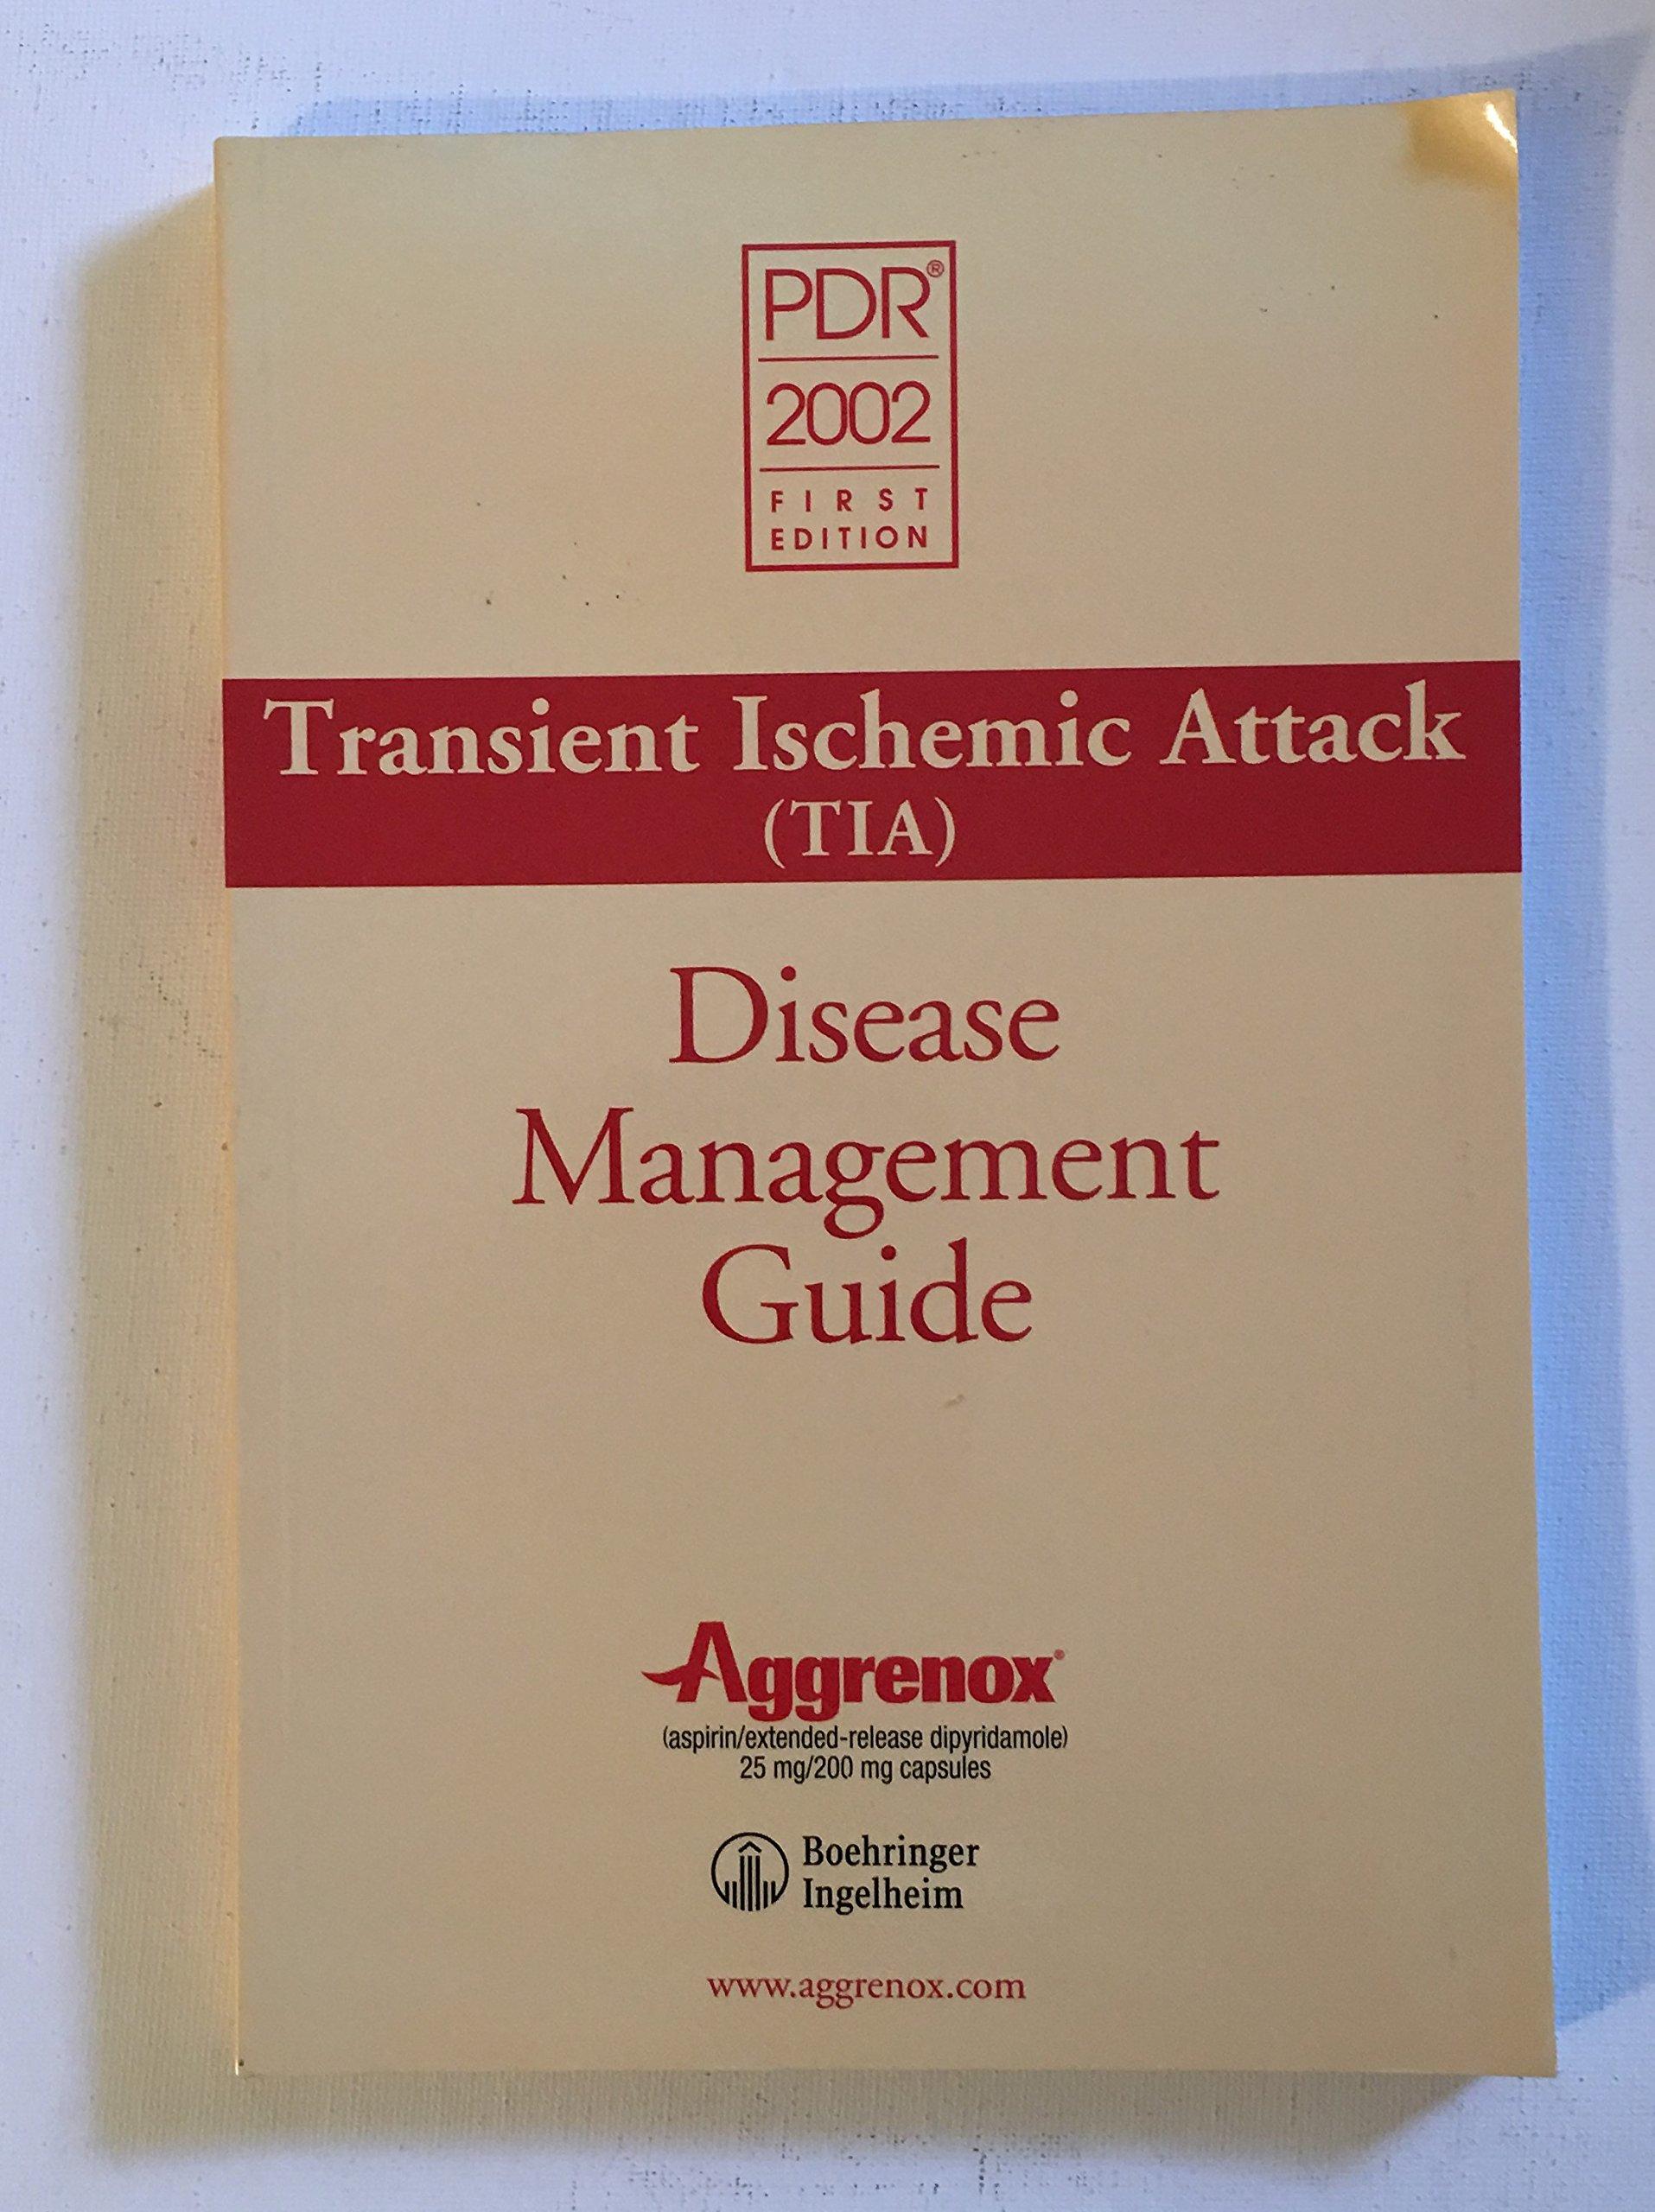 Read Online Transient Ischemic Attack Disease Management Guide: Pdr 2002 pdf epub